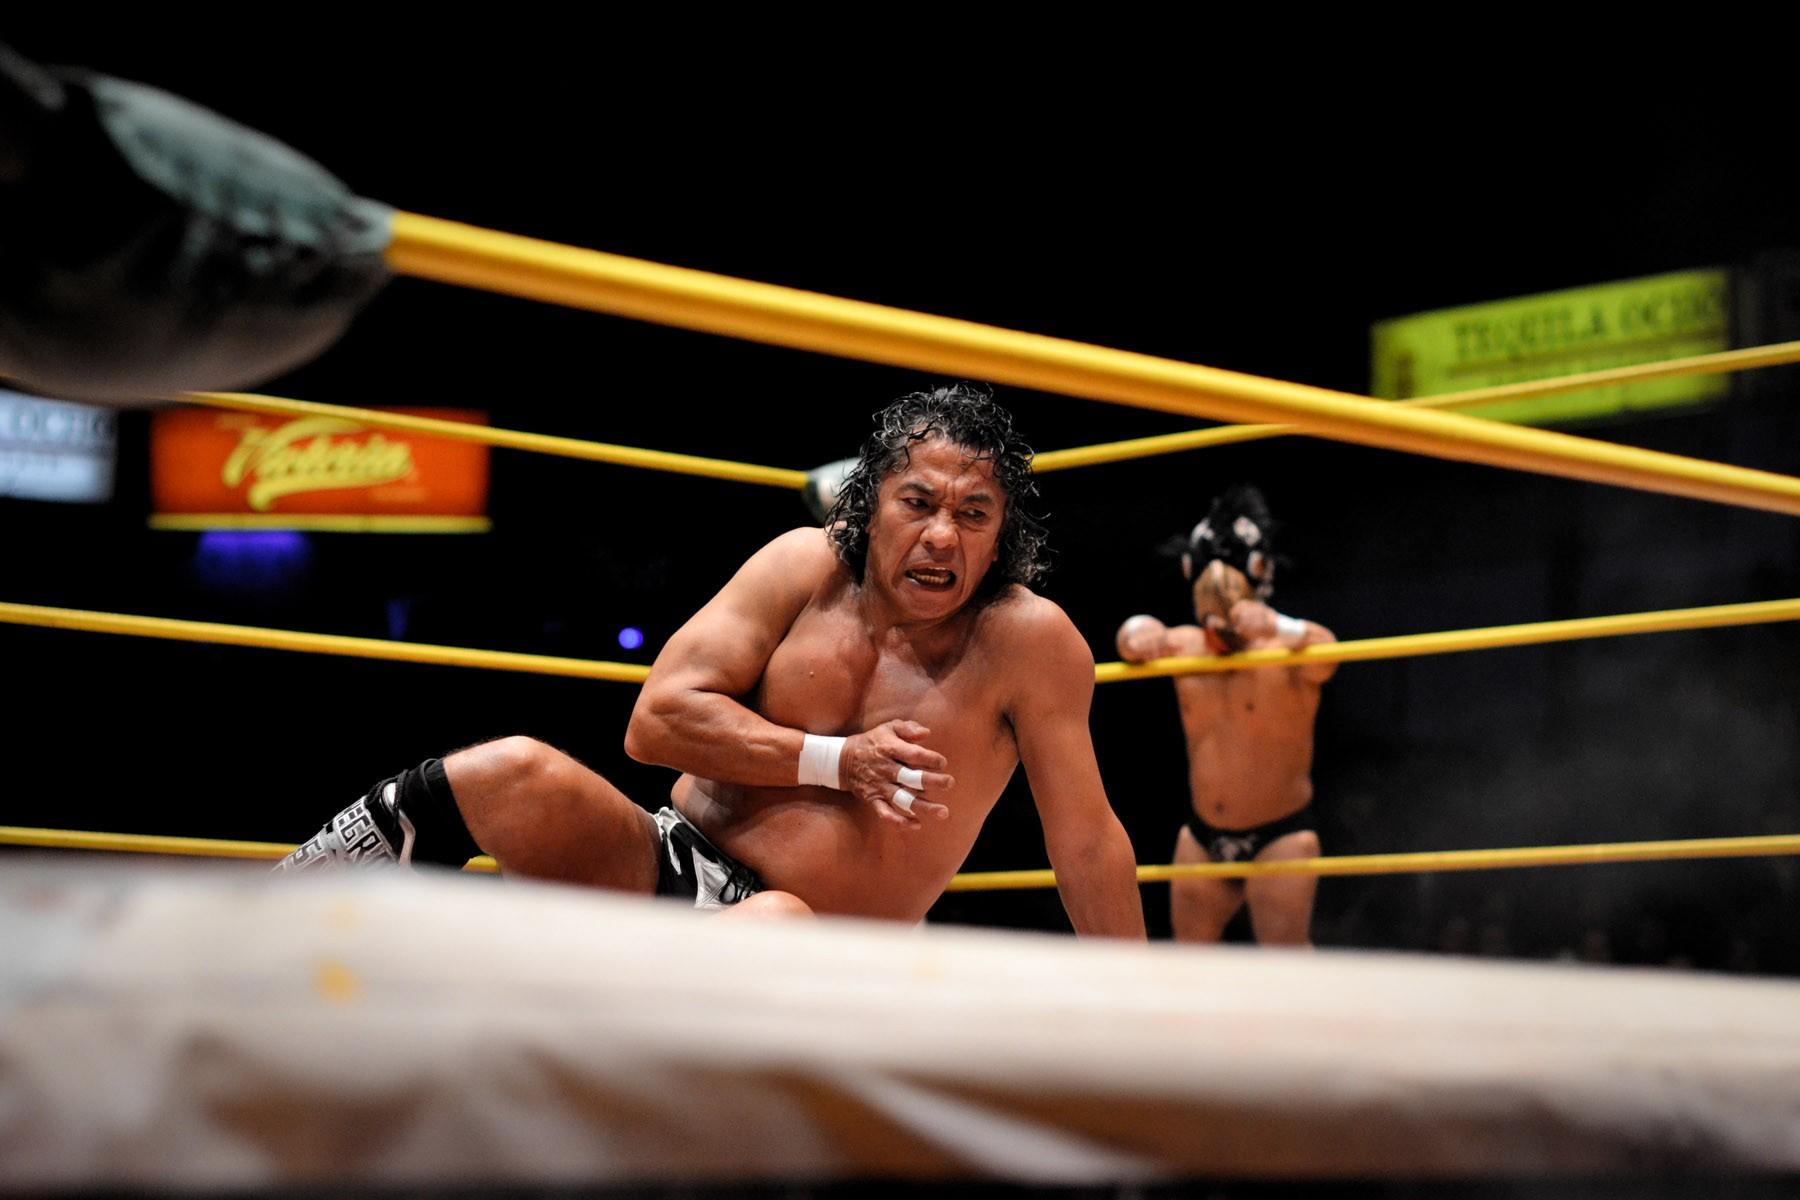 Mexico City native Jose Casas Ruiz aka Negro Casas working his magic in the ring